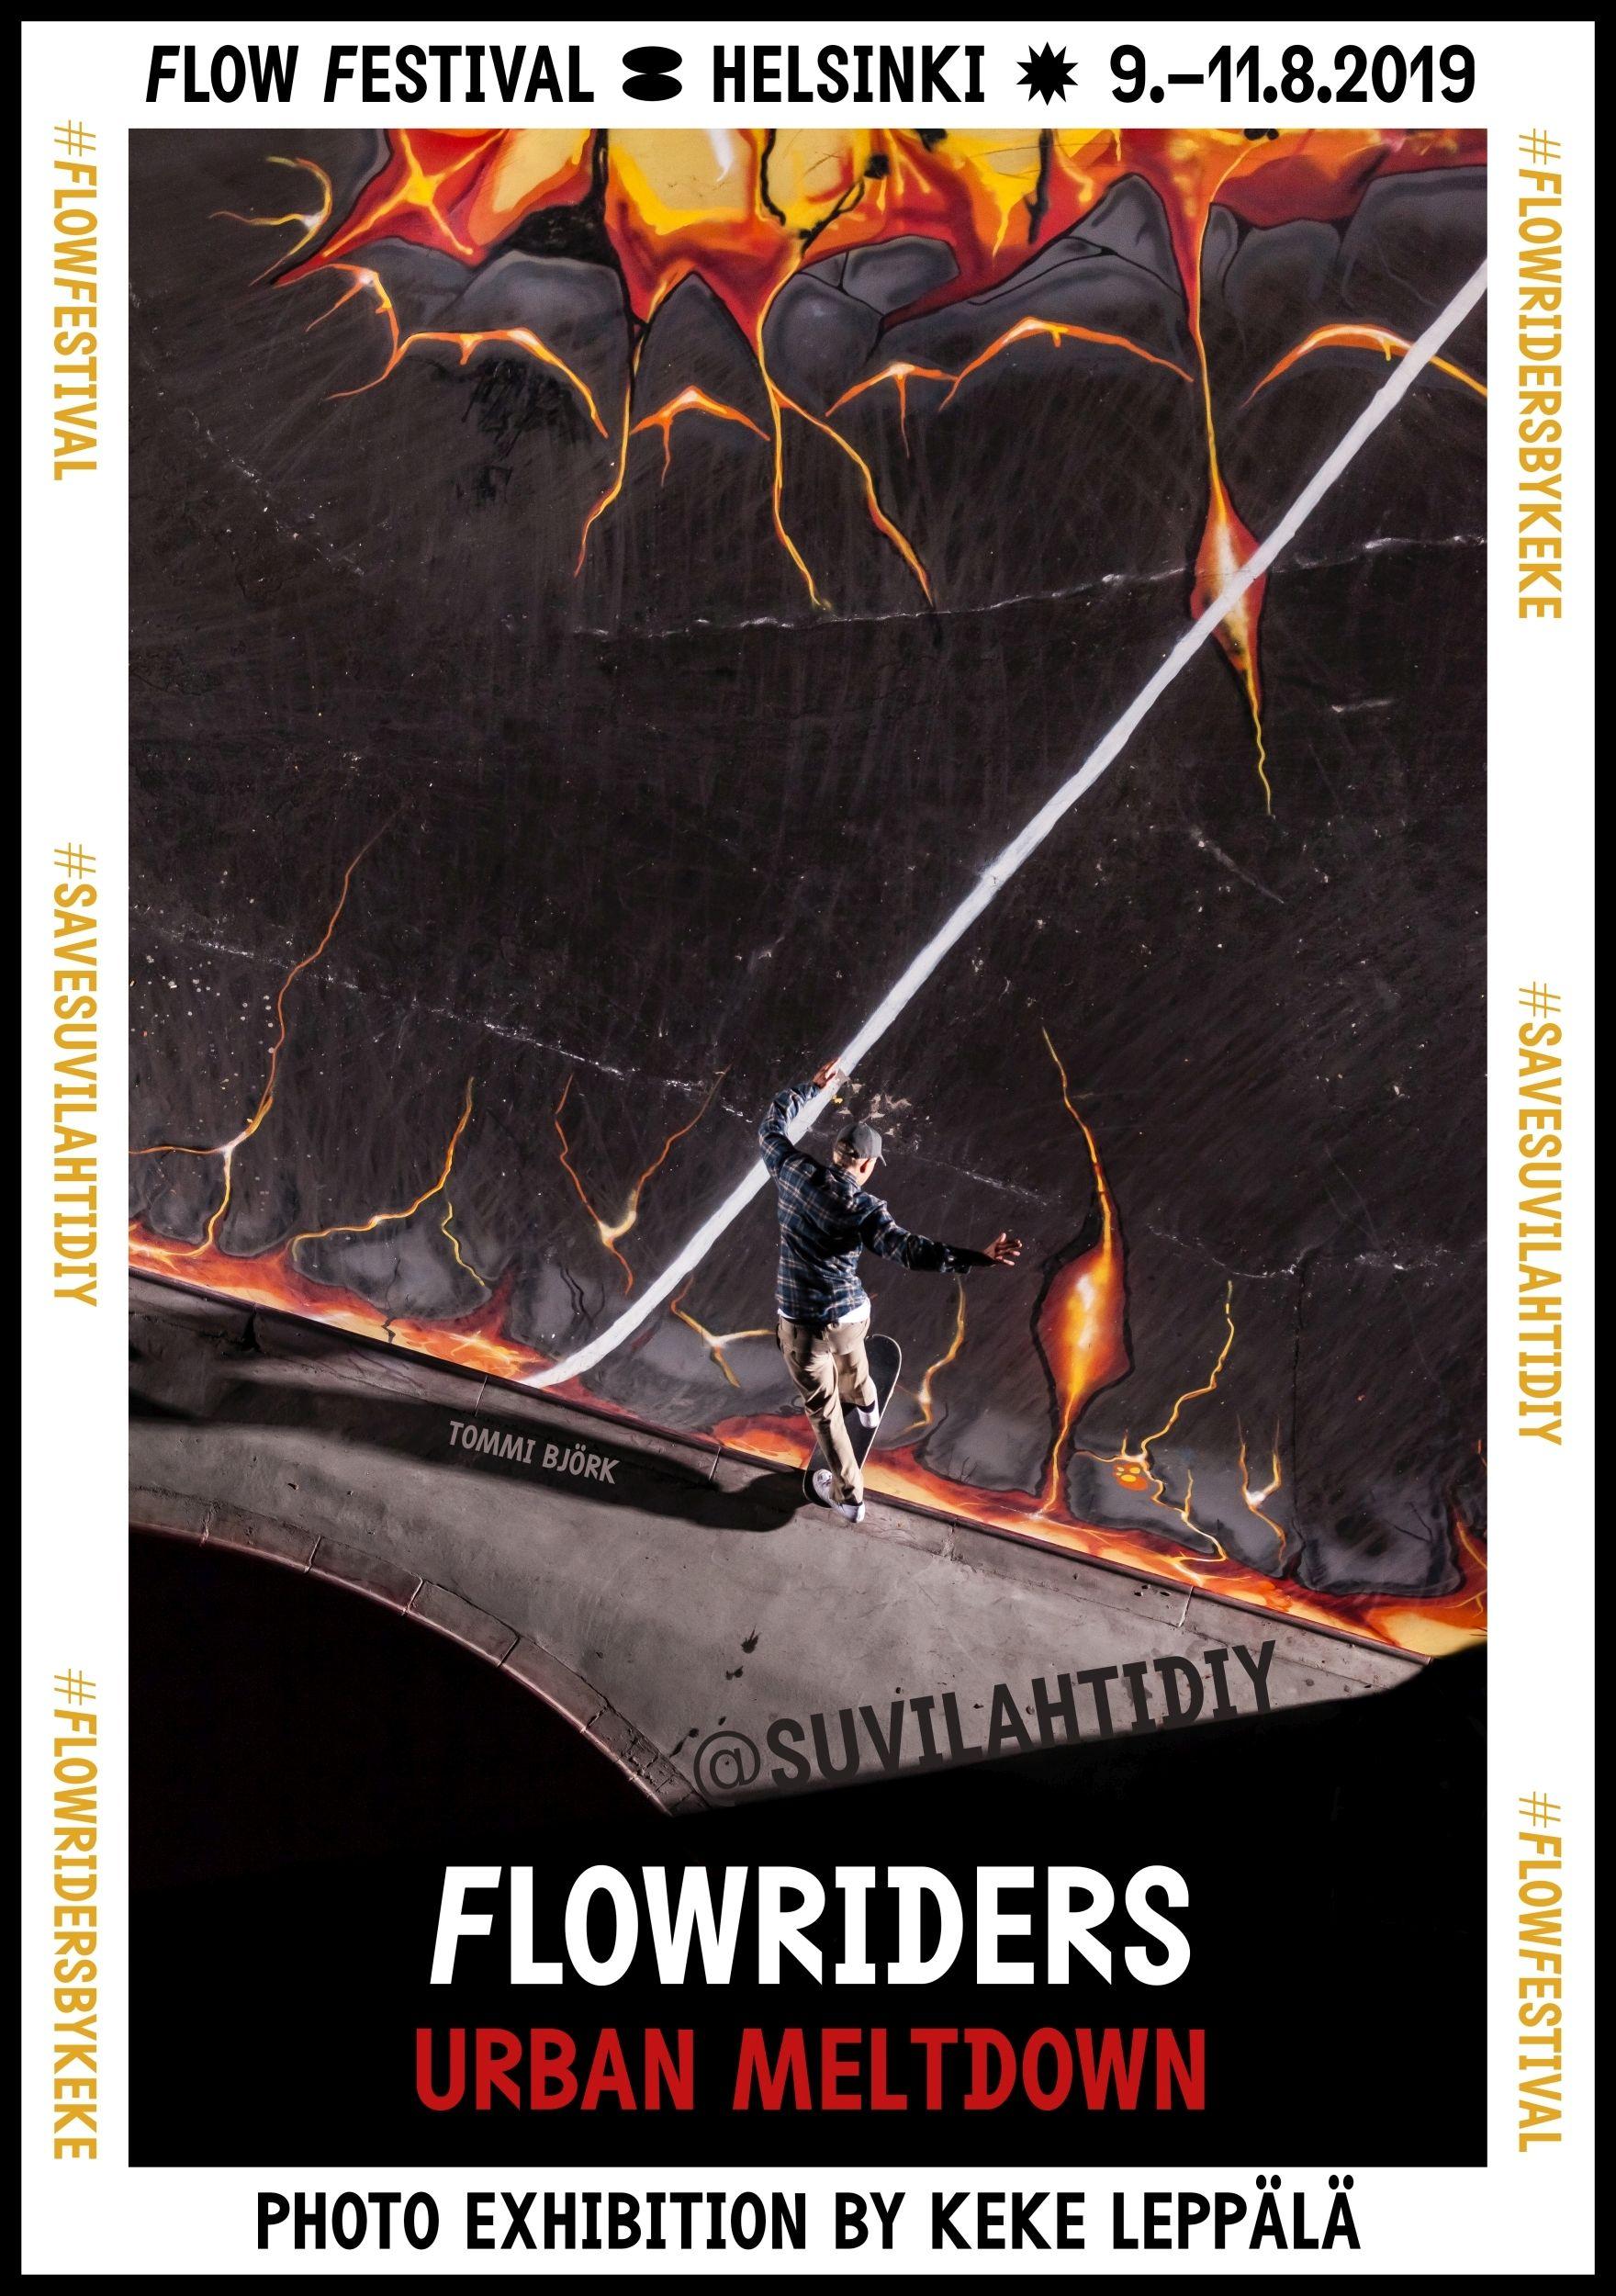 flowriders-urban meltdown flyer1 - Tommi Bjork - 2019 kekeleppala.jpg